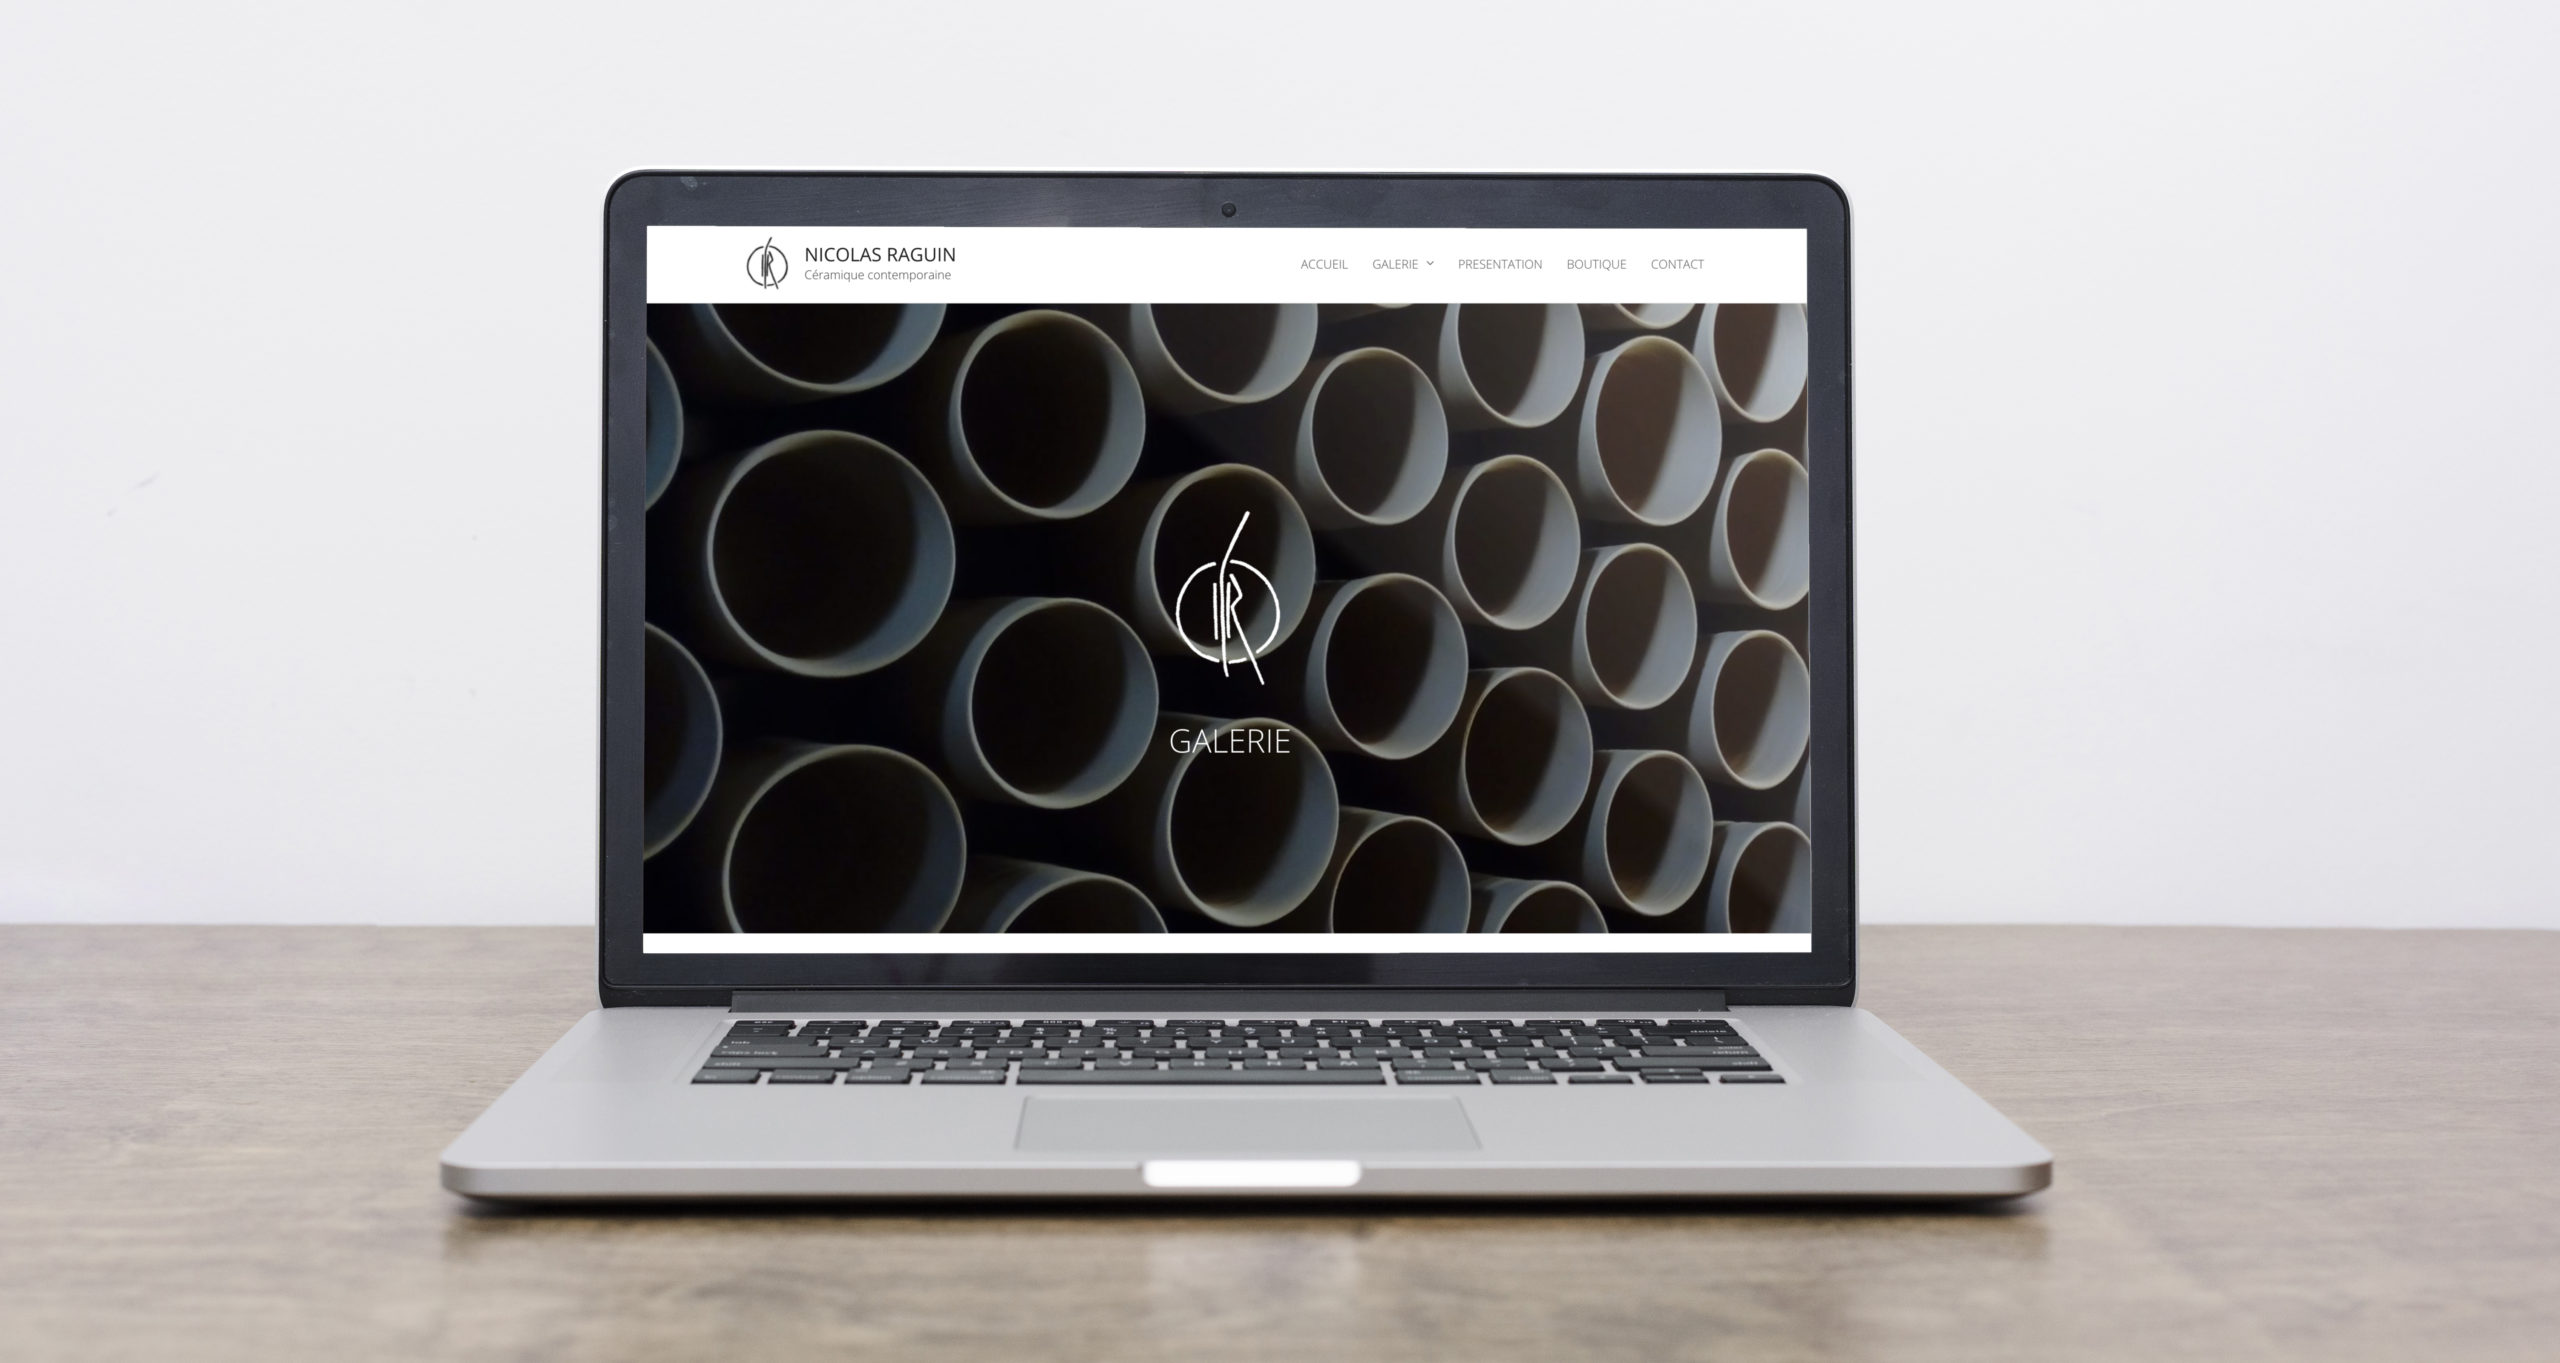 laptop-website-nicolasraguin1